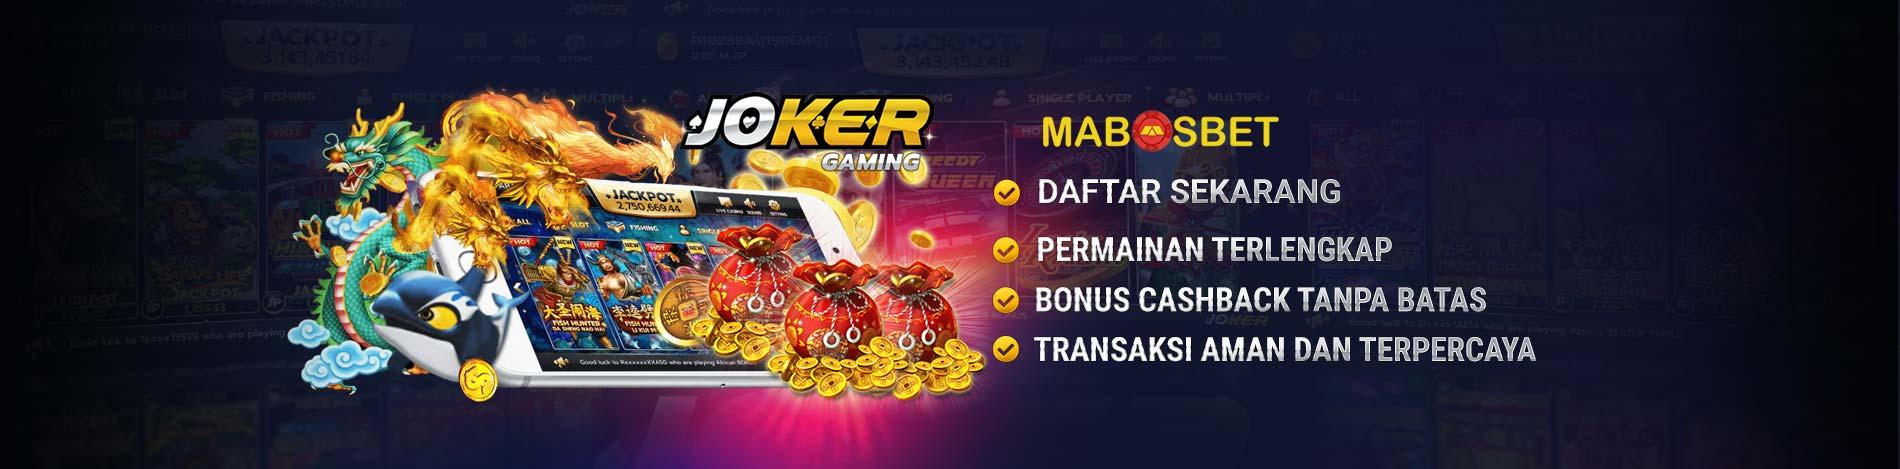 Agen Slot Joker123 Terbaru